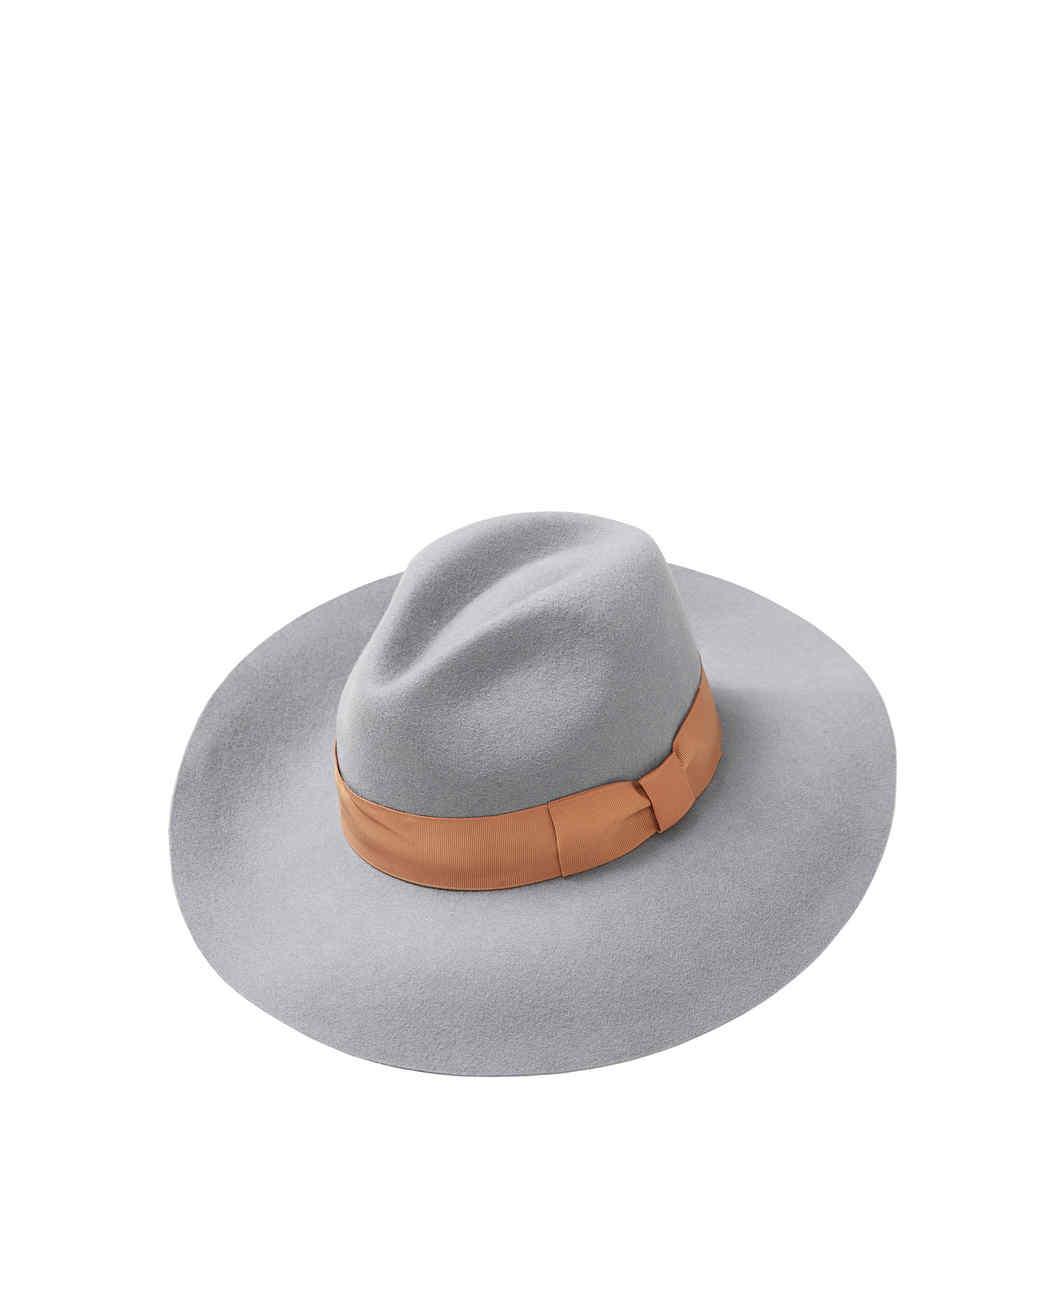 Gray hat